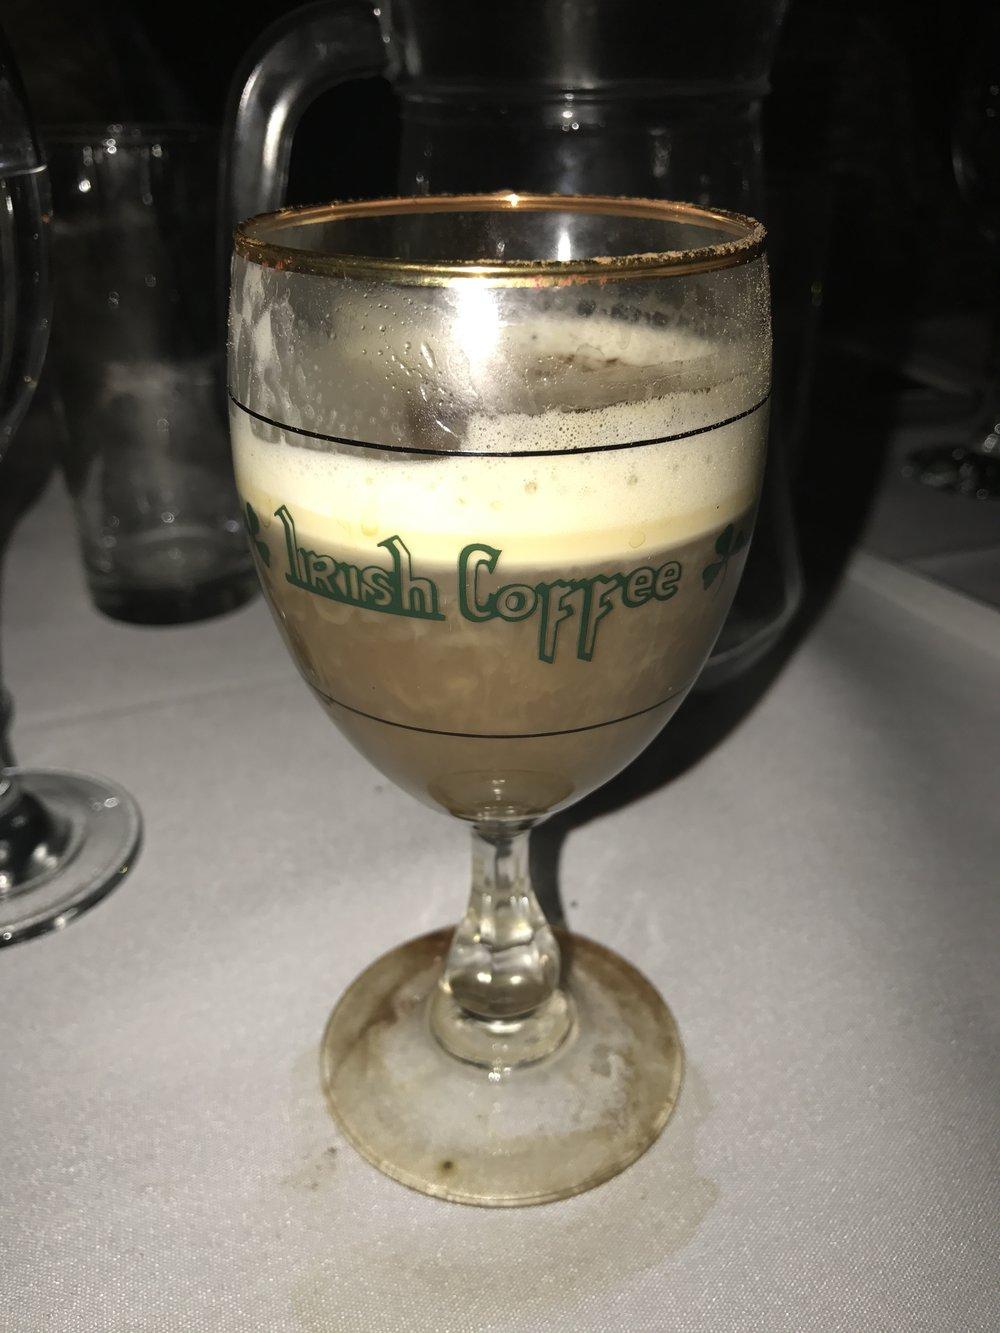 The Irish CoffeeI will mention below!